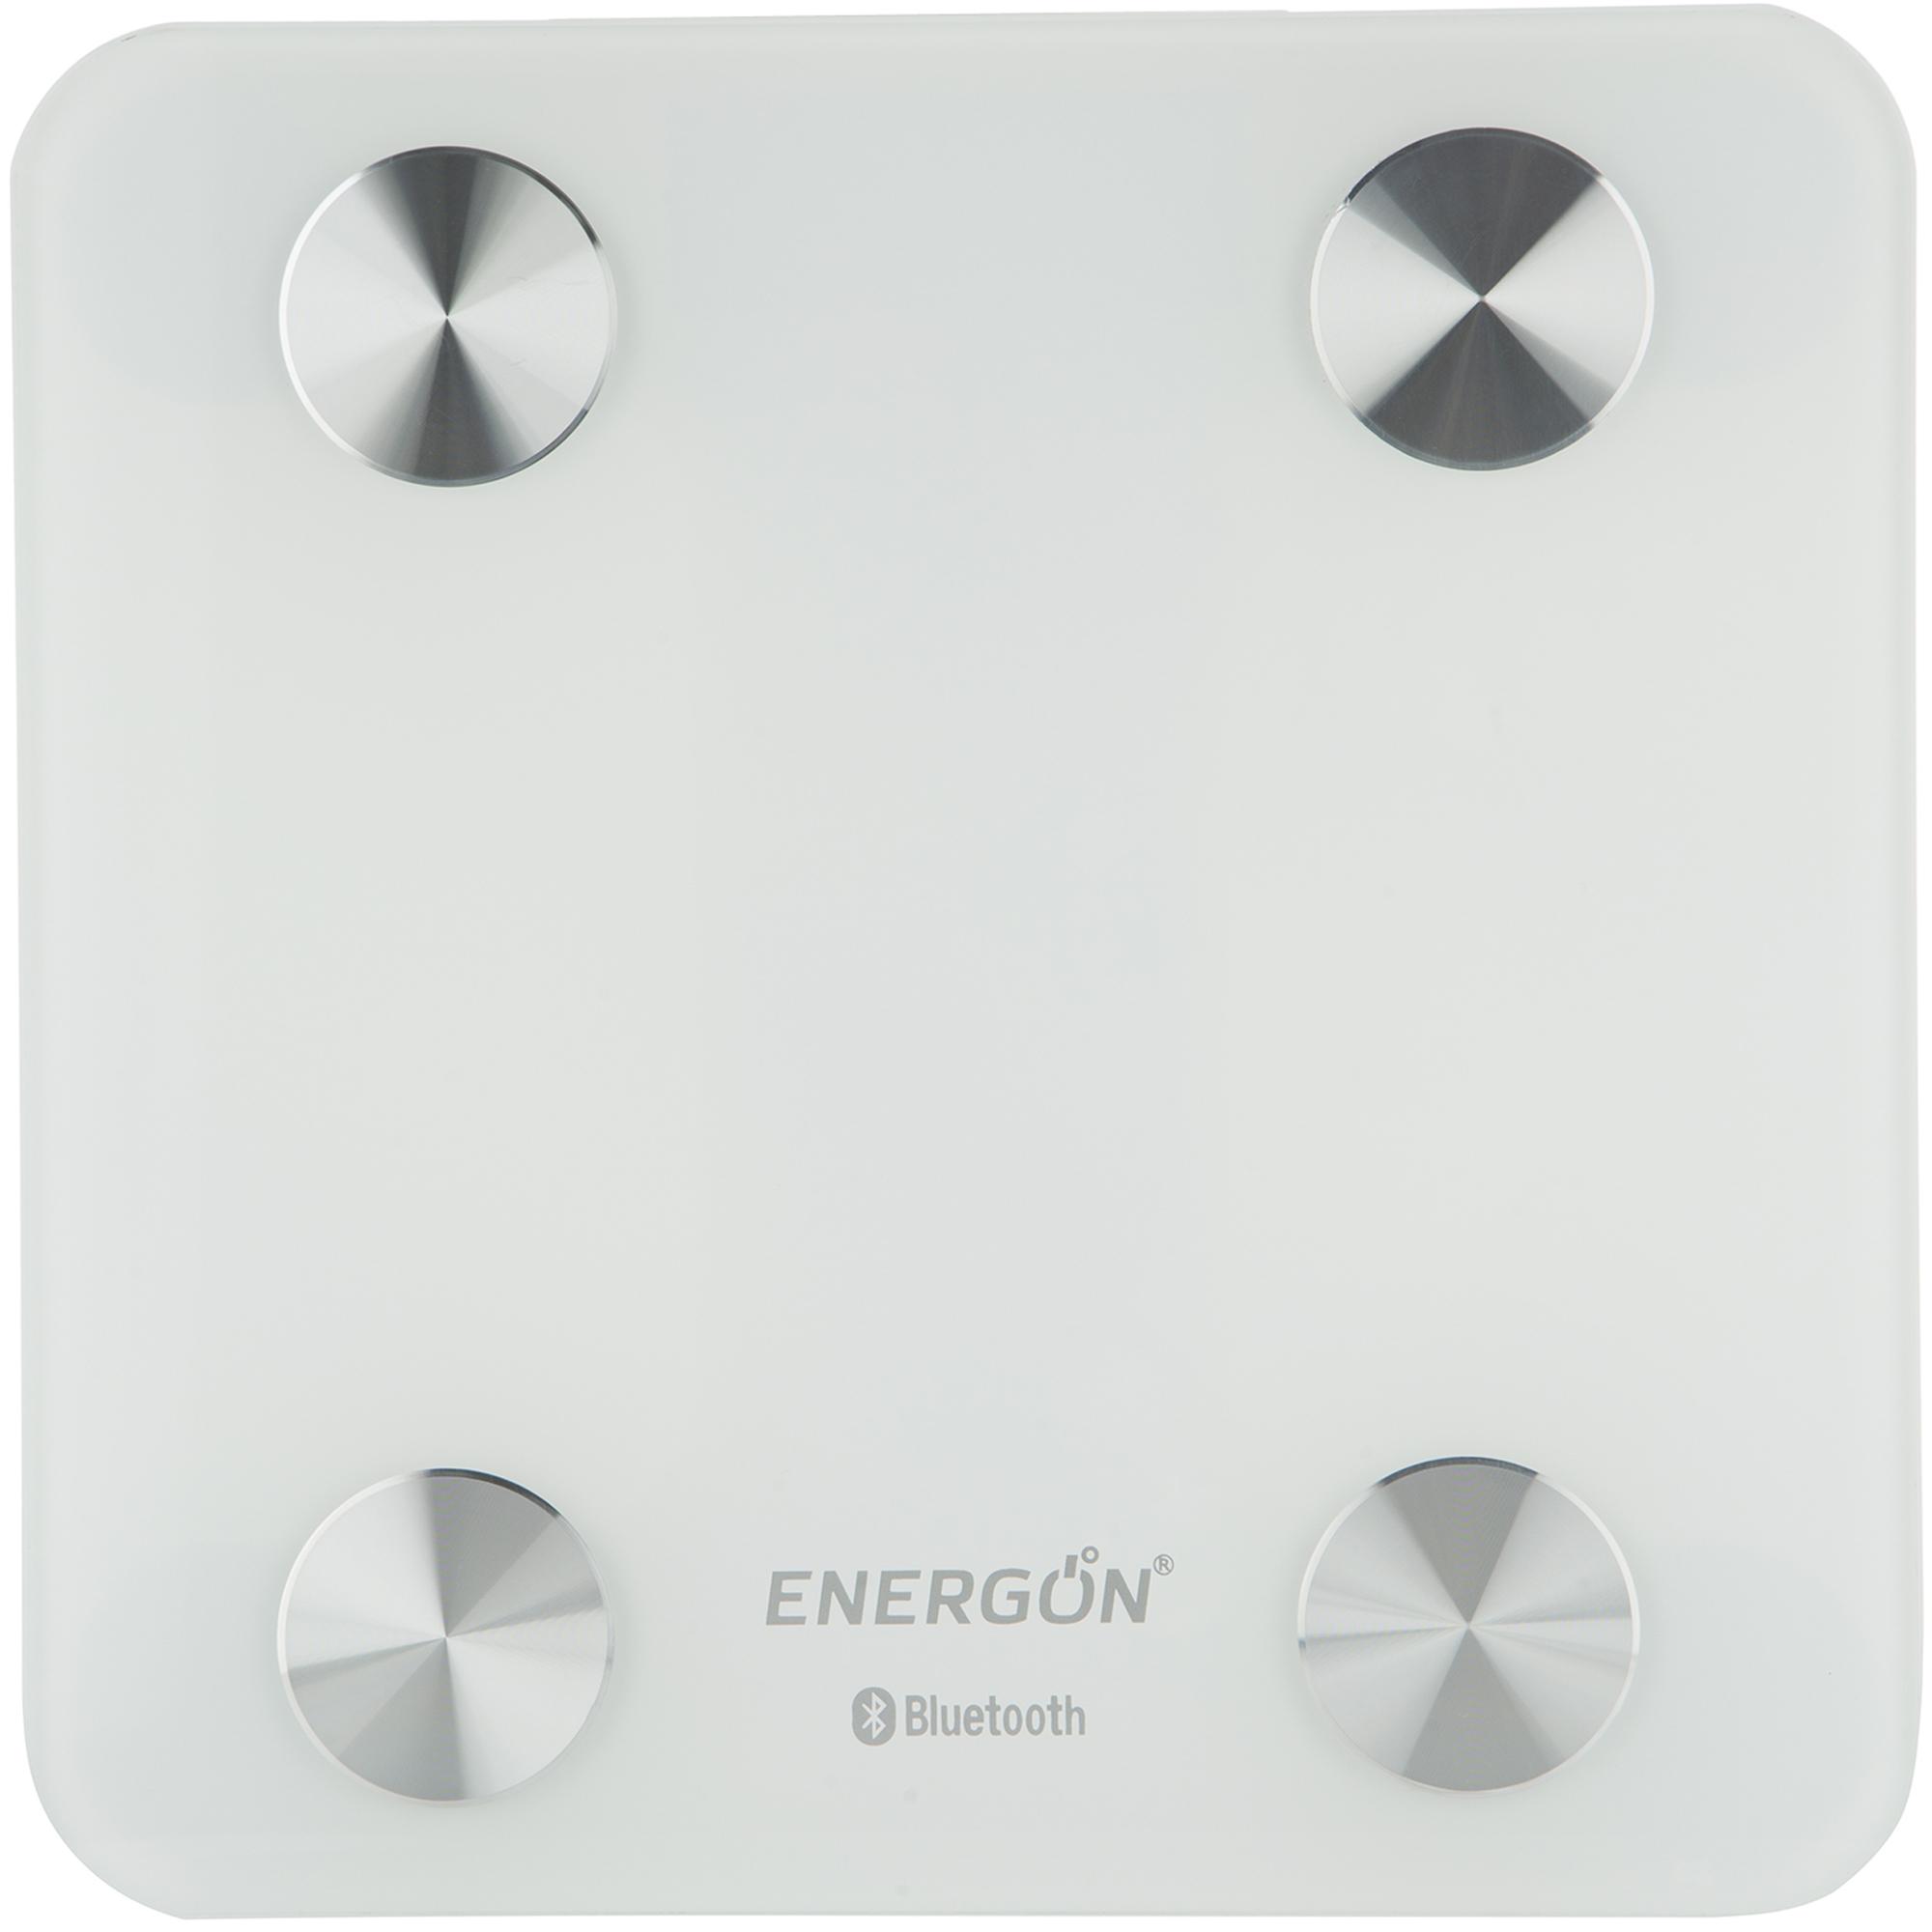 Energon Умные весы ENERGON Smart Scales